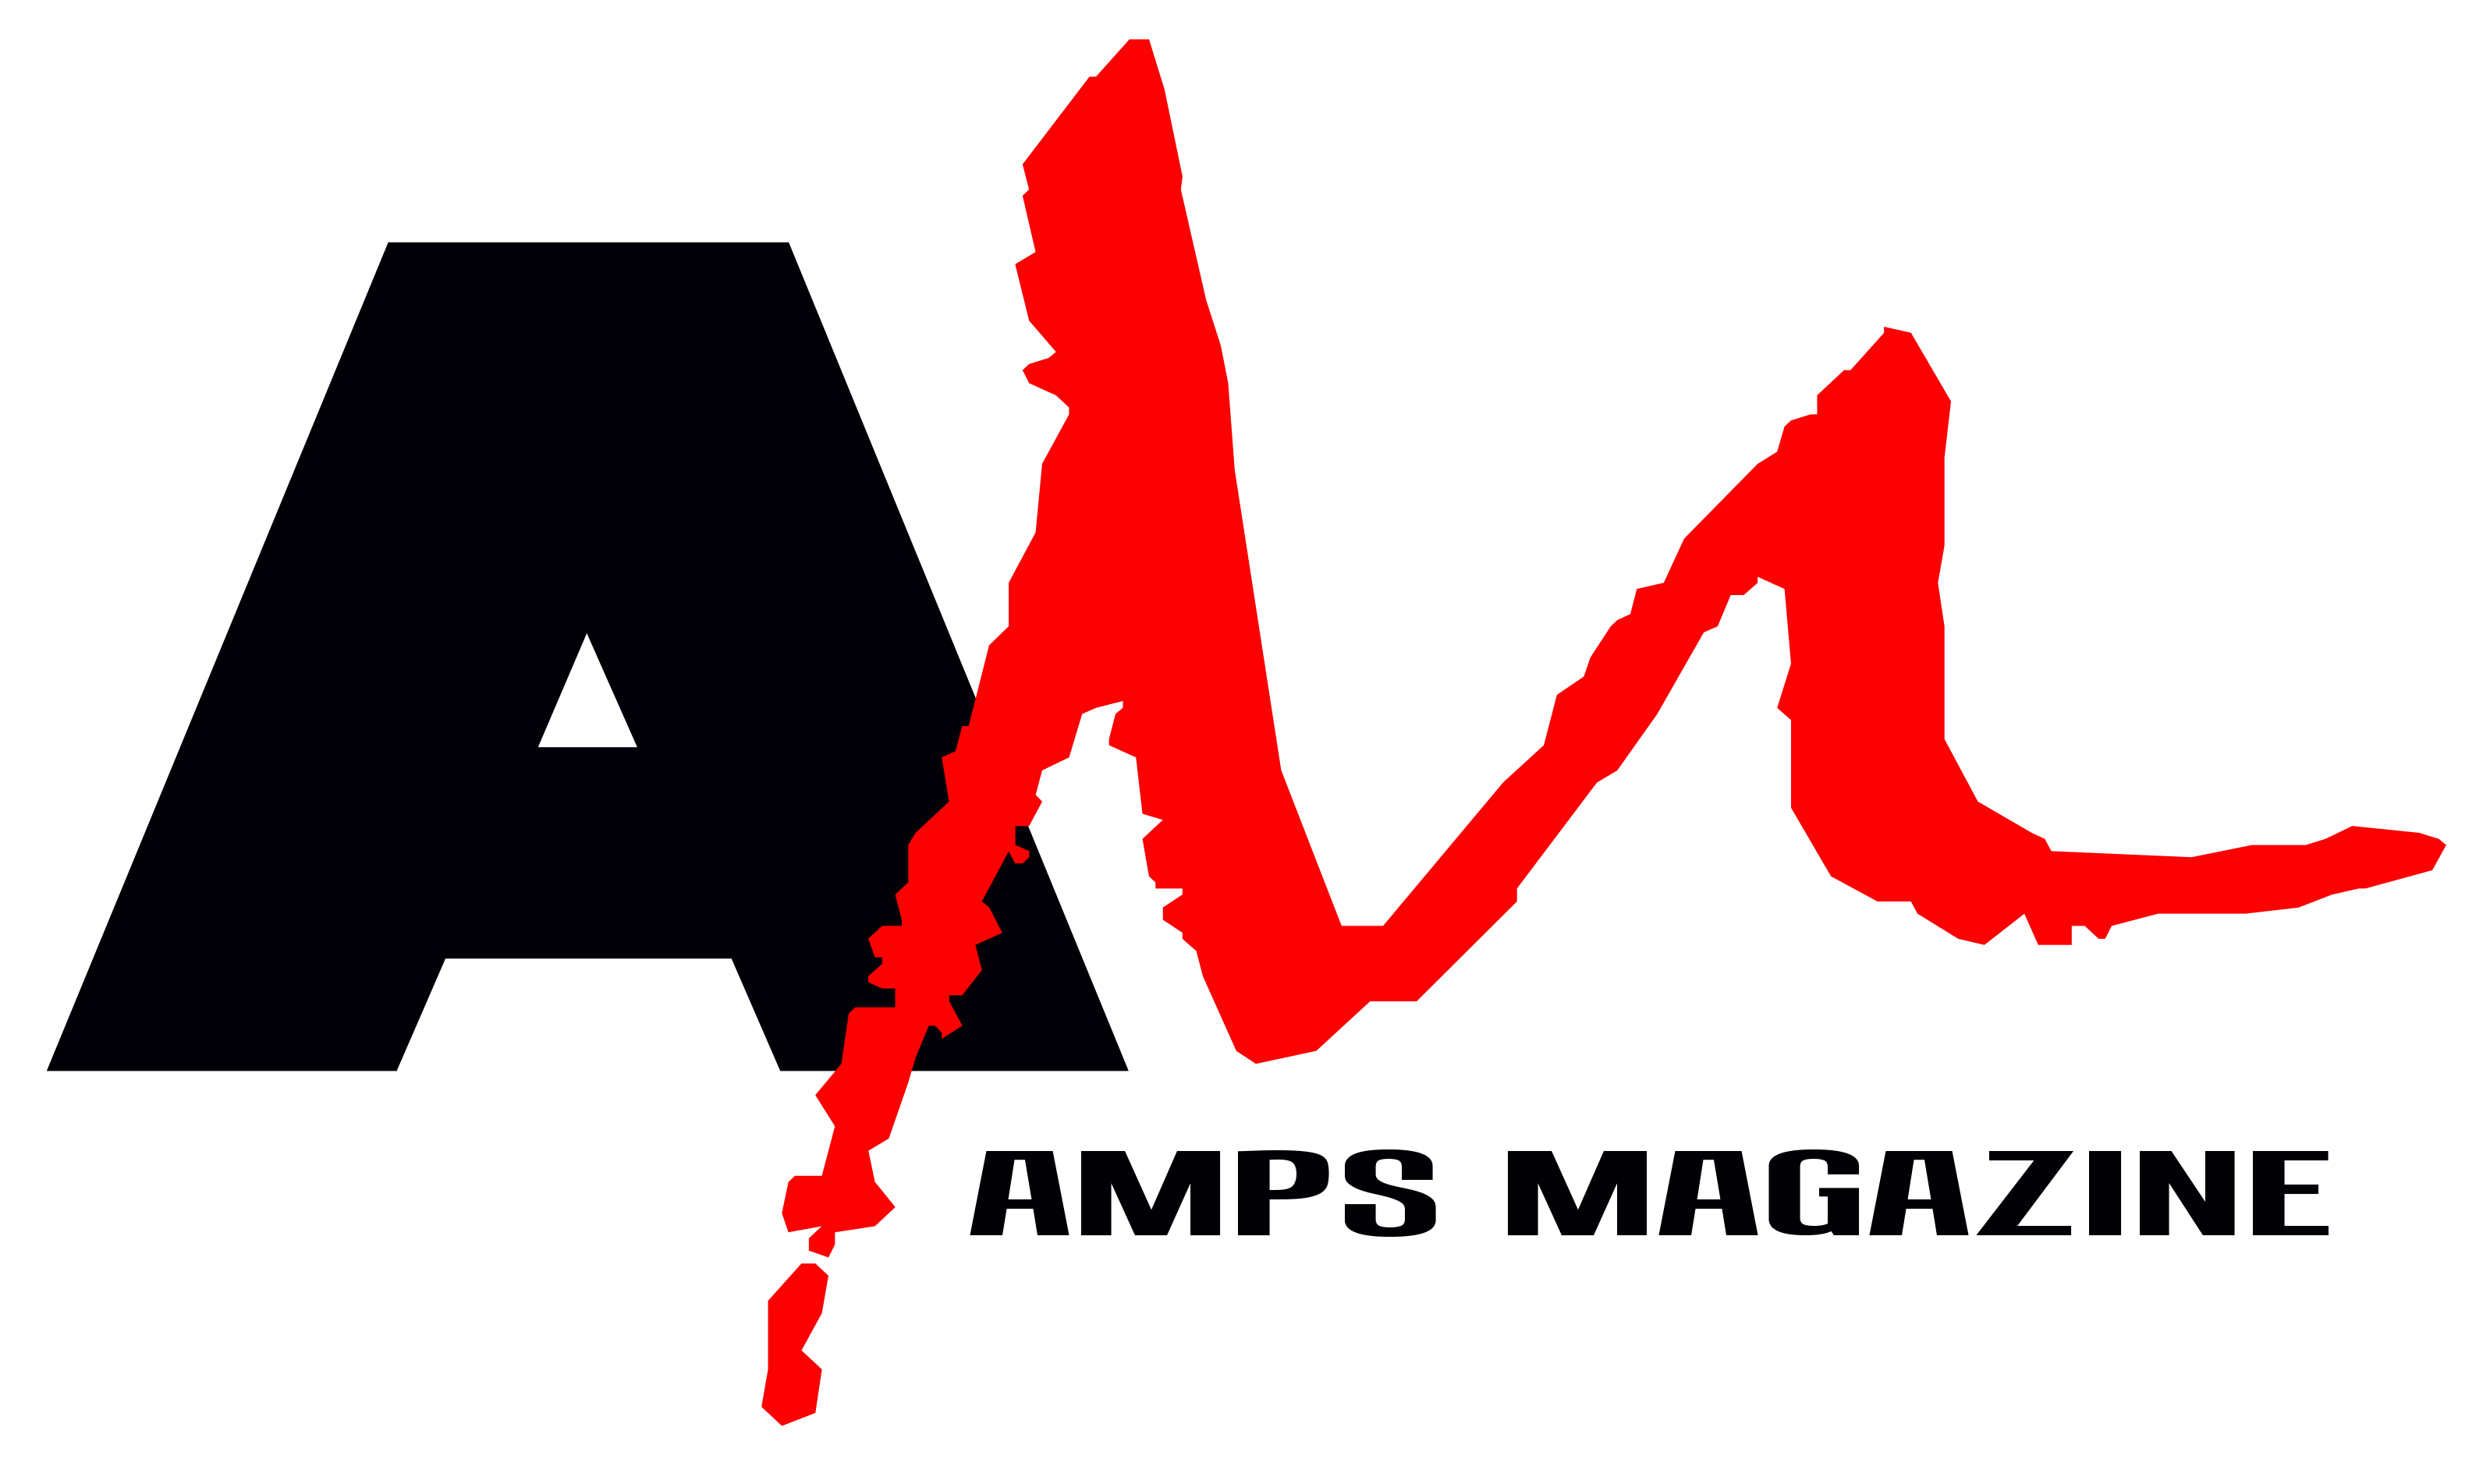 http://ampsmagazine.com/wp-content/uploads/2019/12/2017-Logo.png